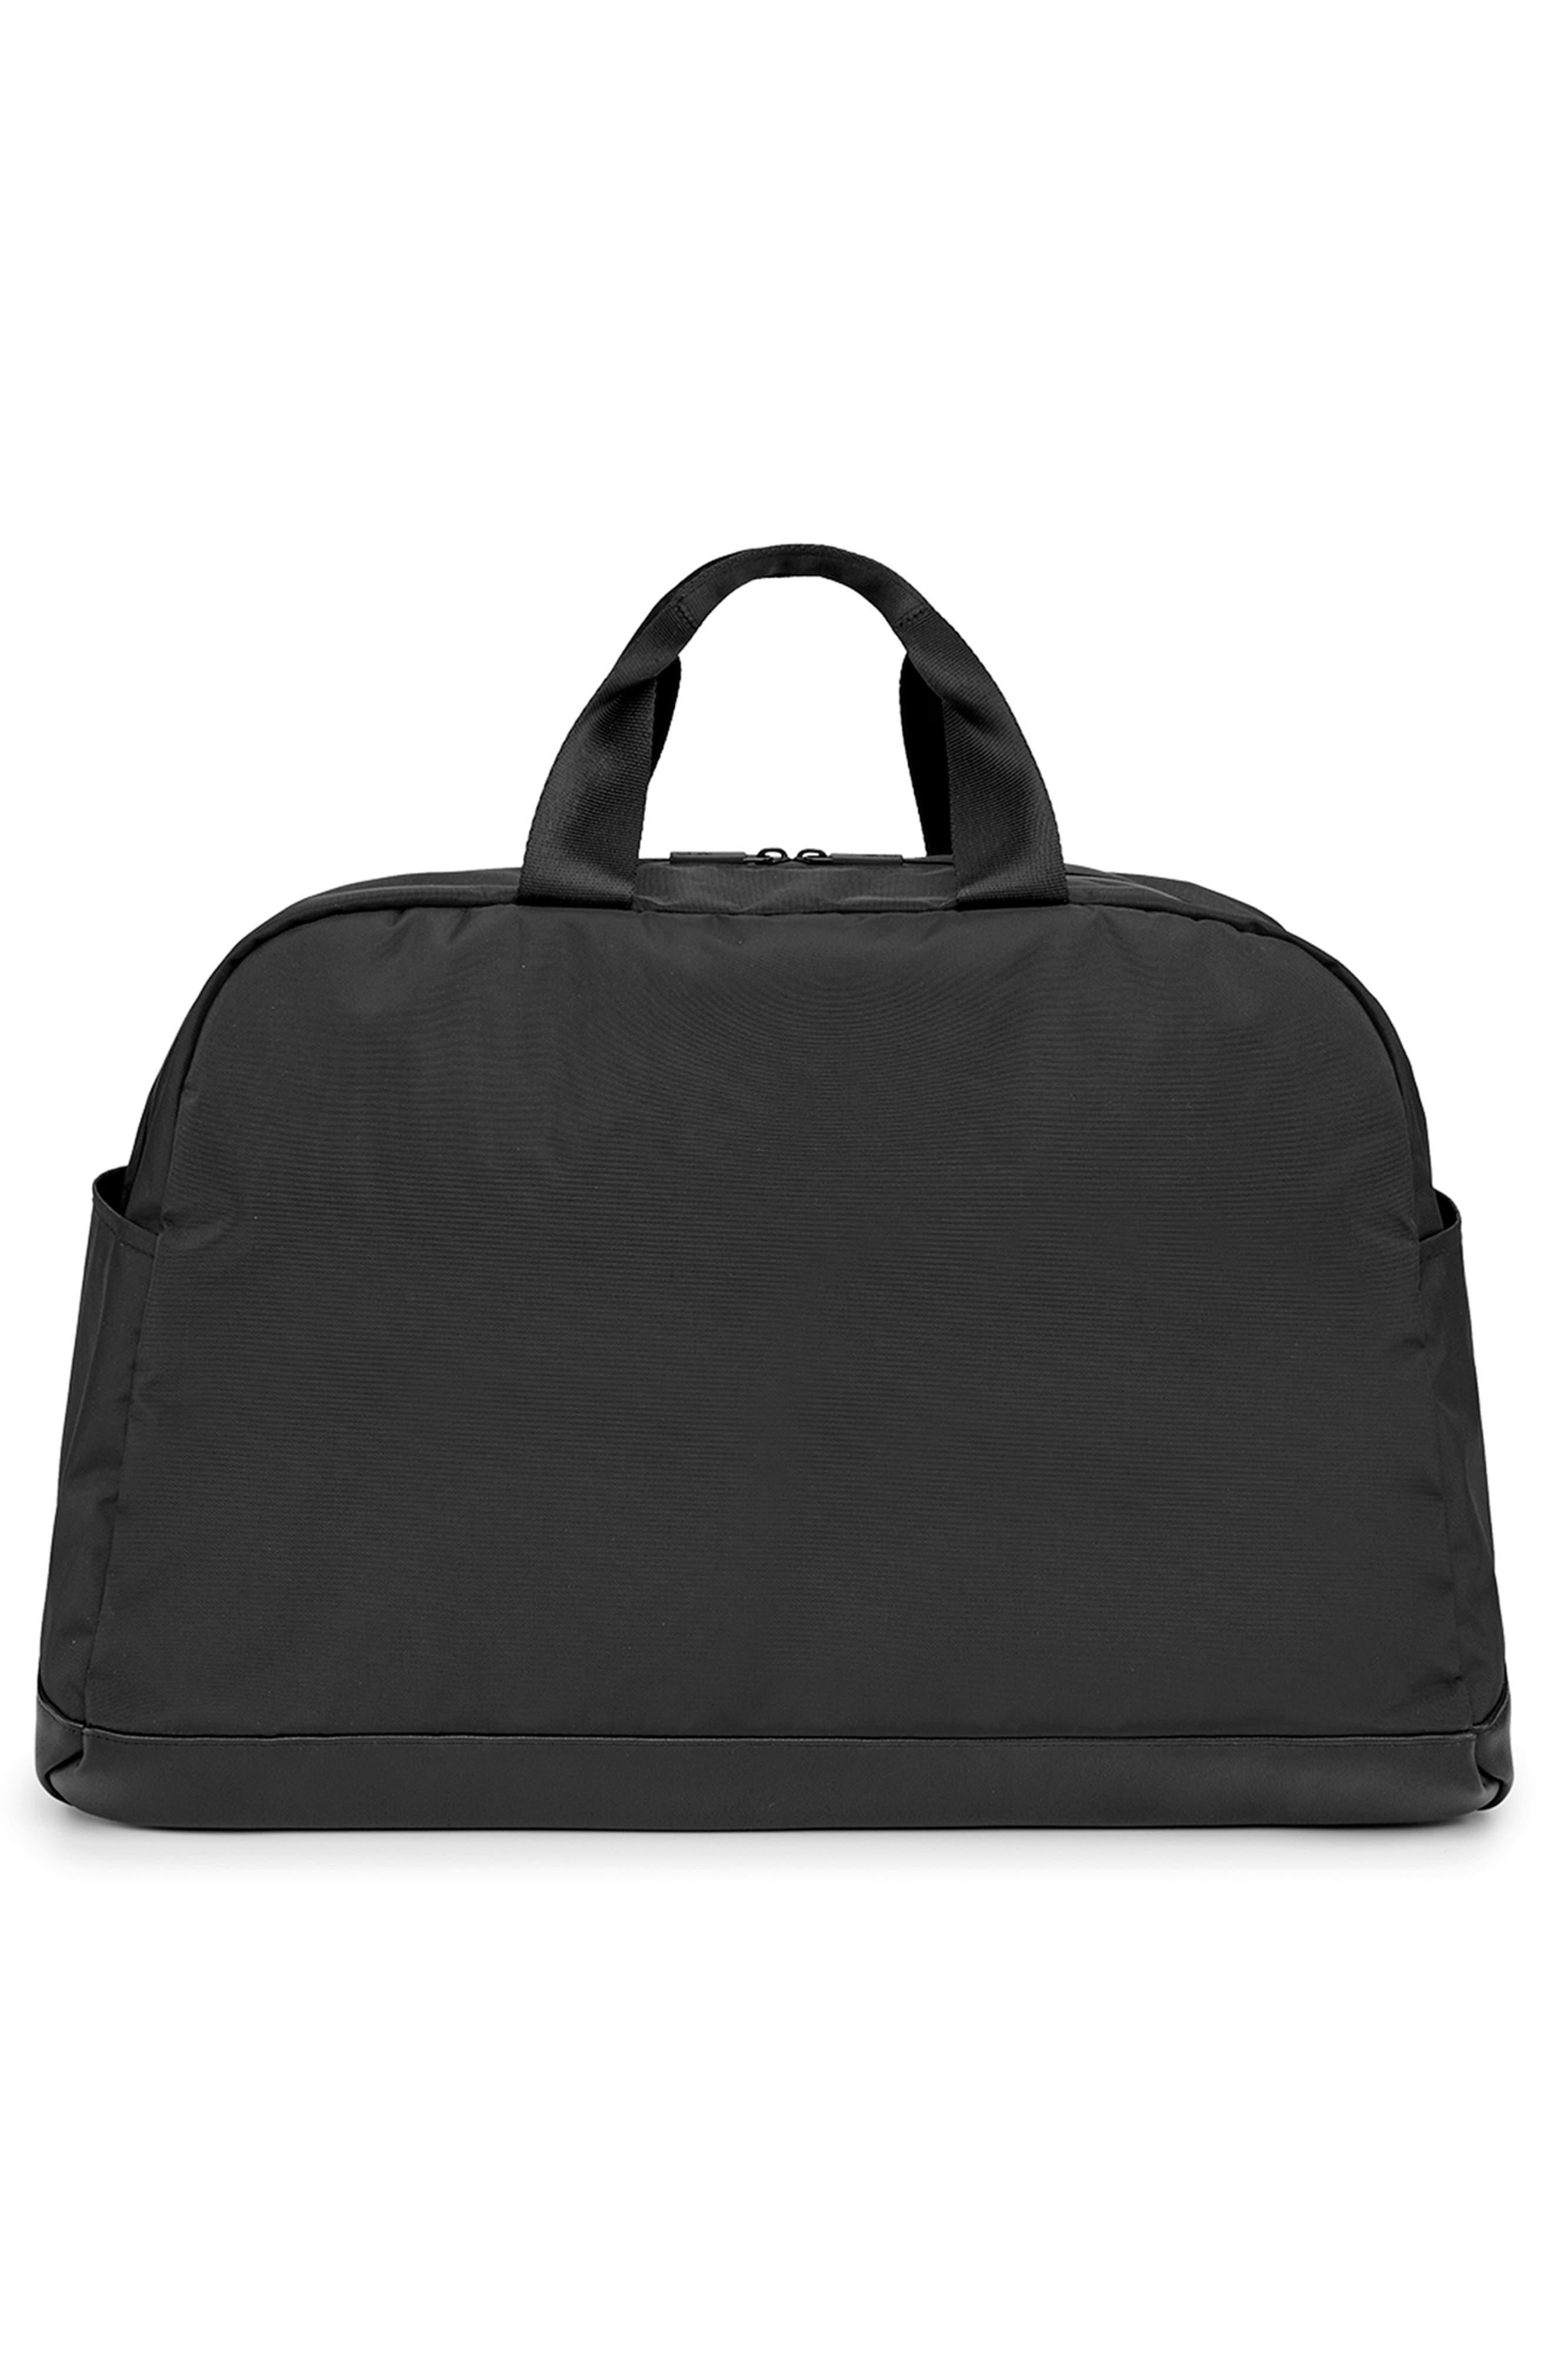 MOLESKINE, Moleskin Metro Duffle Bag, Alternate thumbnail 2, color, BLACK